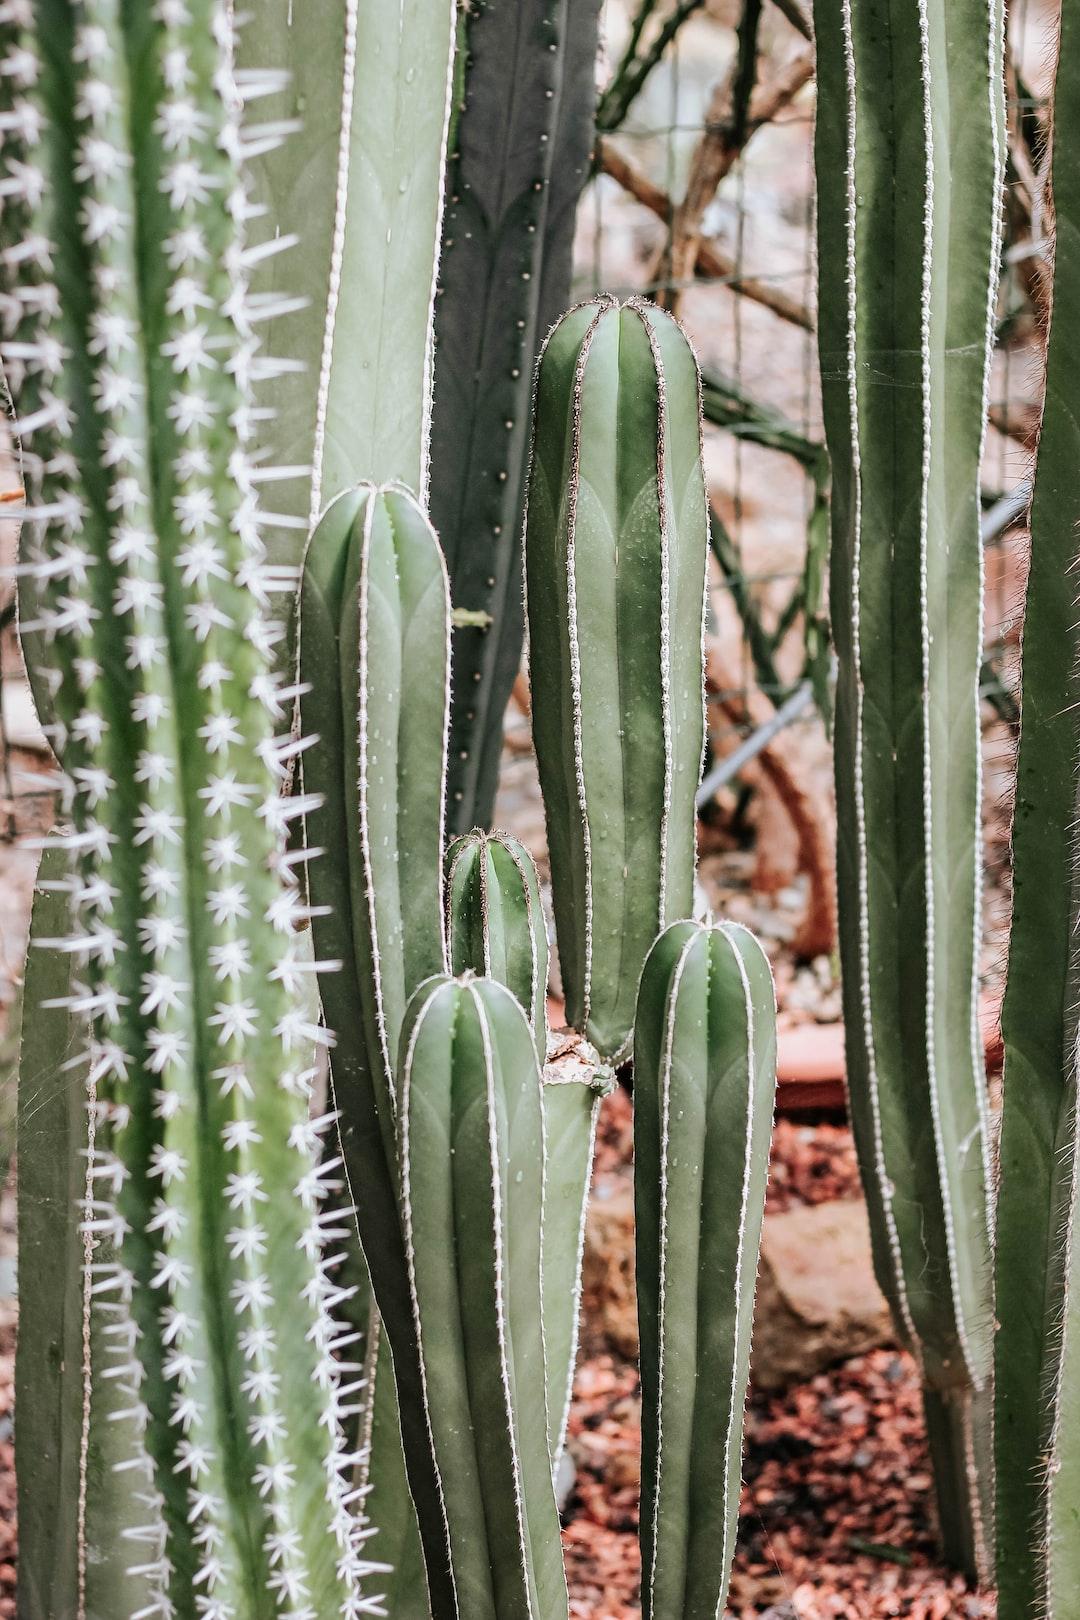 Cacti, Arboretum and Botanical Garden Trompenburg, Rotterdam The Netherlands